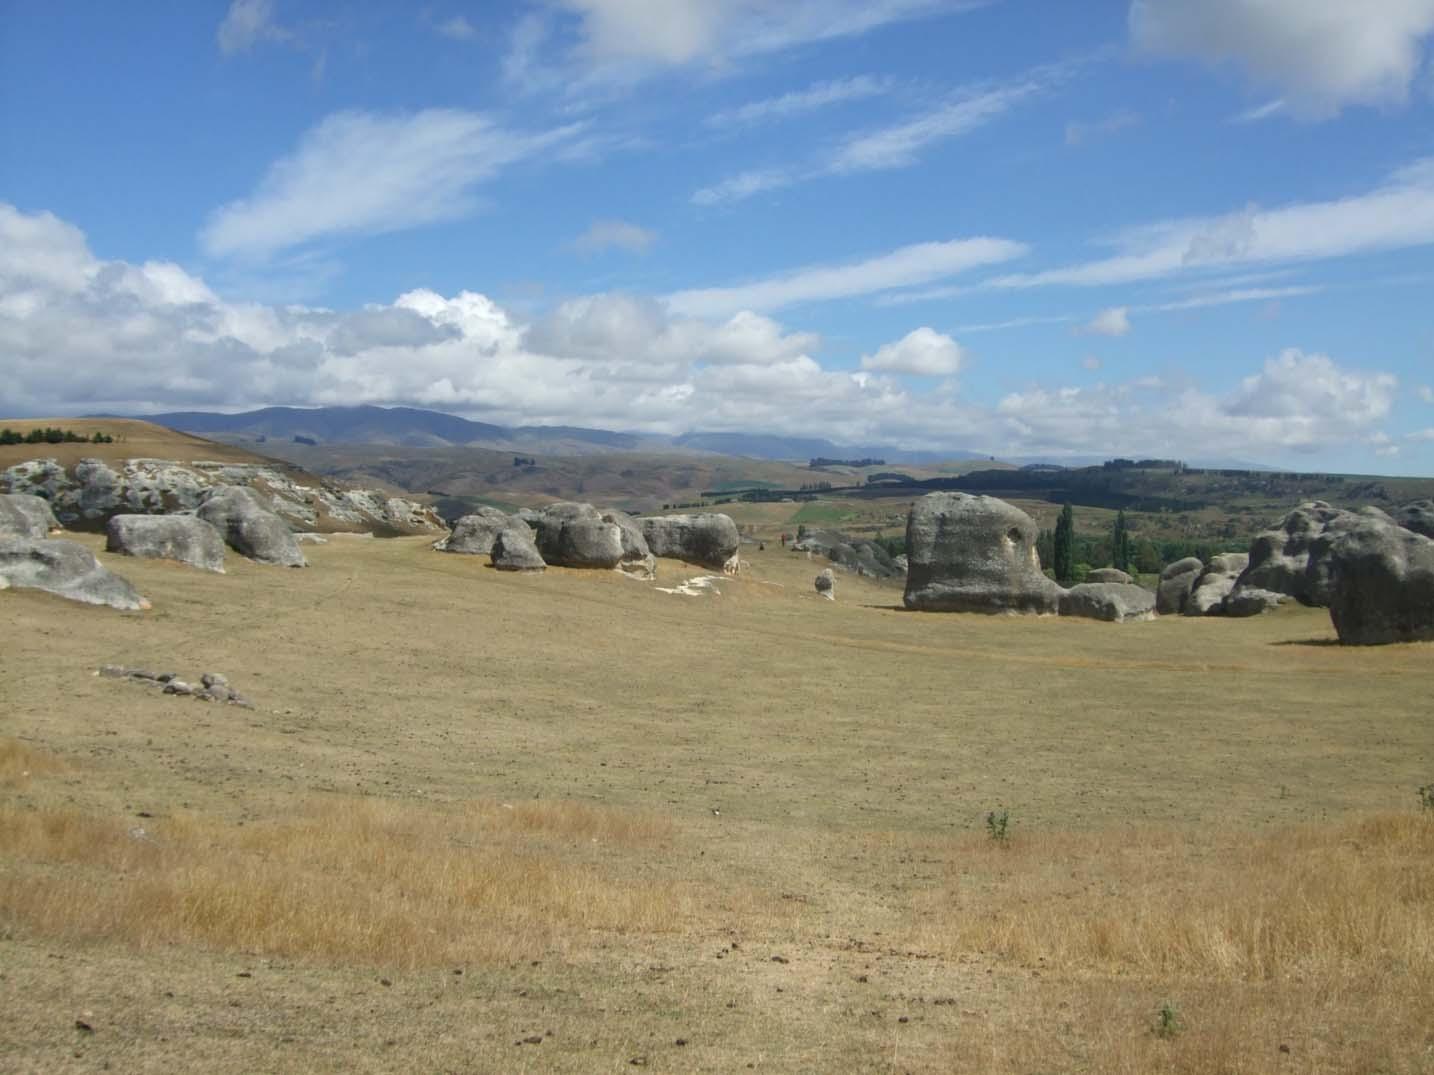 Approaching the Elephant Rocks, Otago